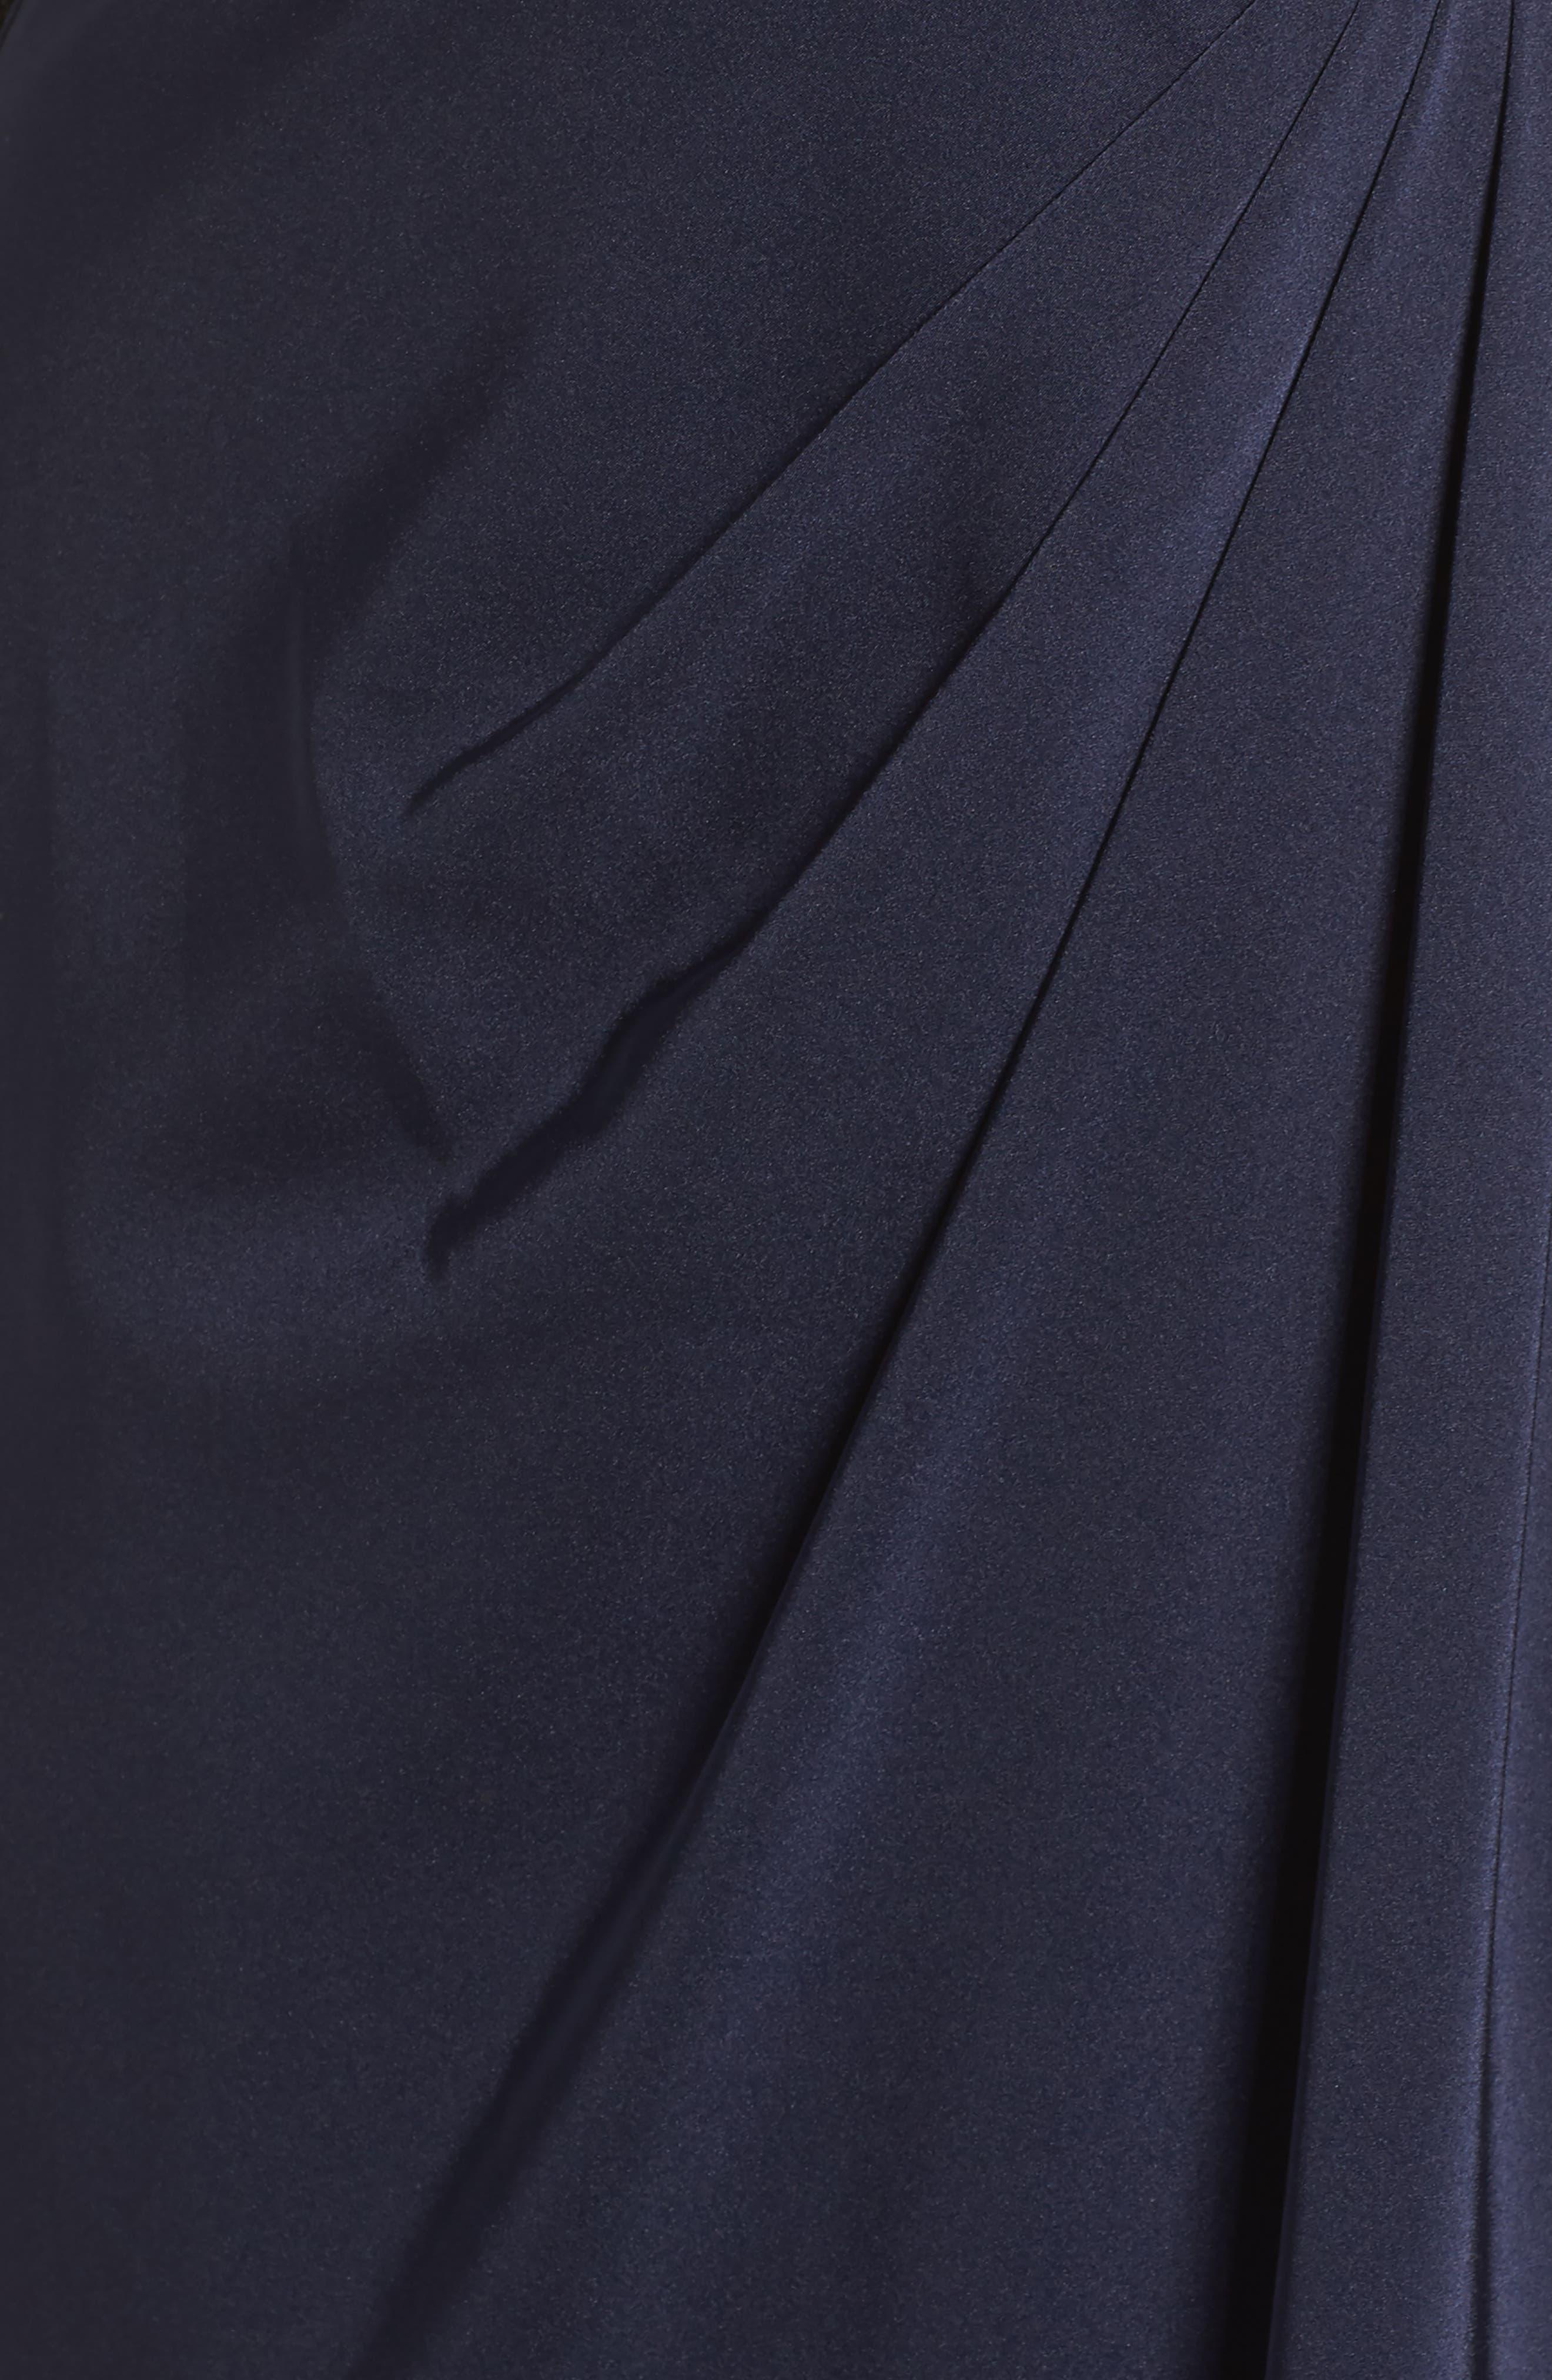 LA FEMME, Bead Embellished Gown, Alternate thumbnail 5, color, NAVY